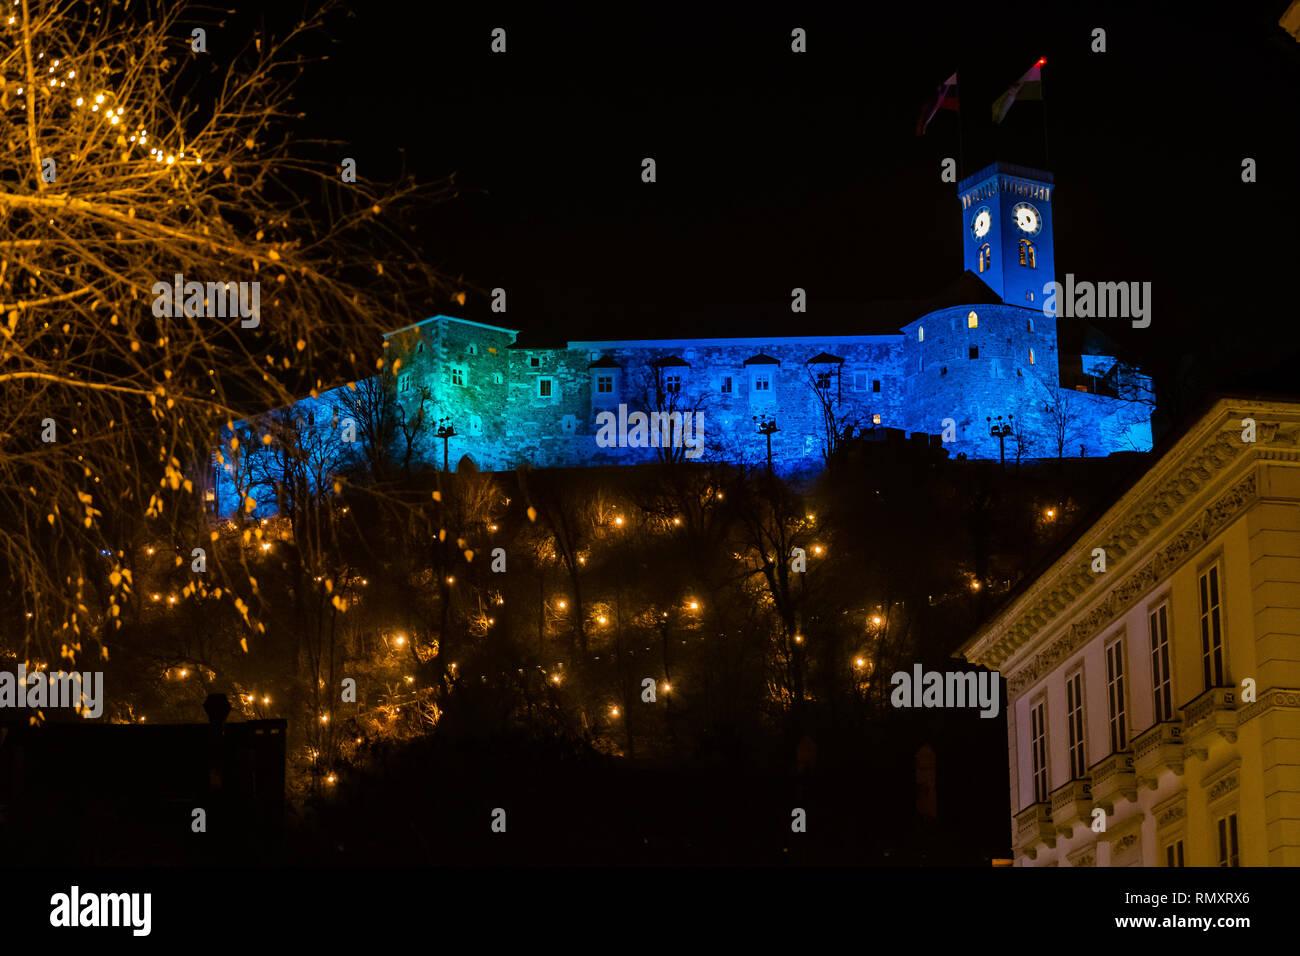 Burg bei Nacht - Stock Image